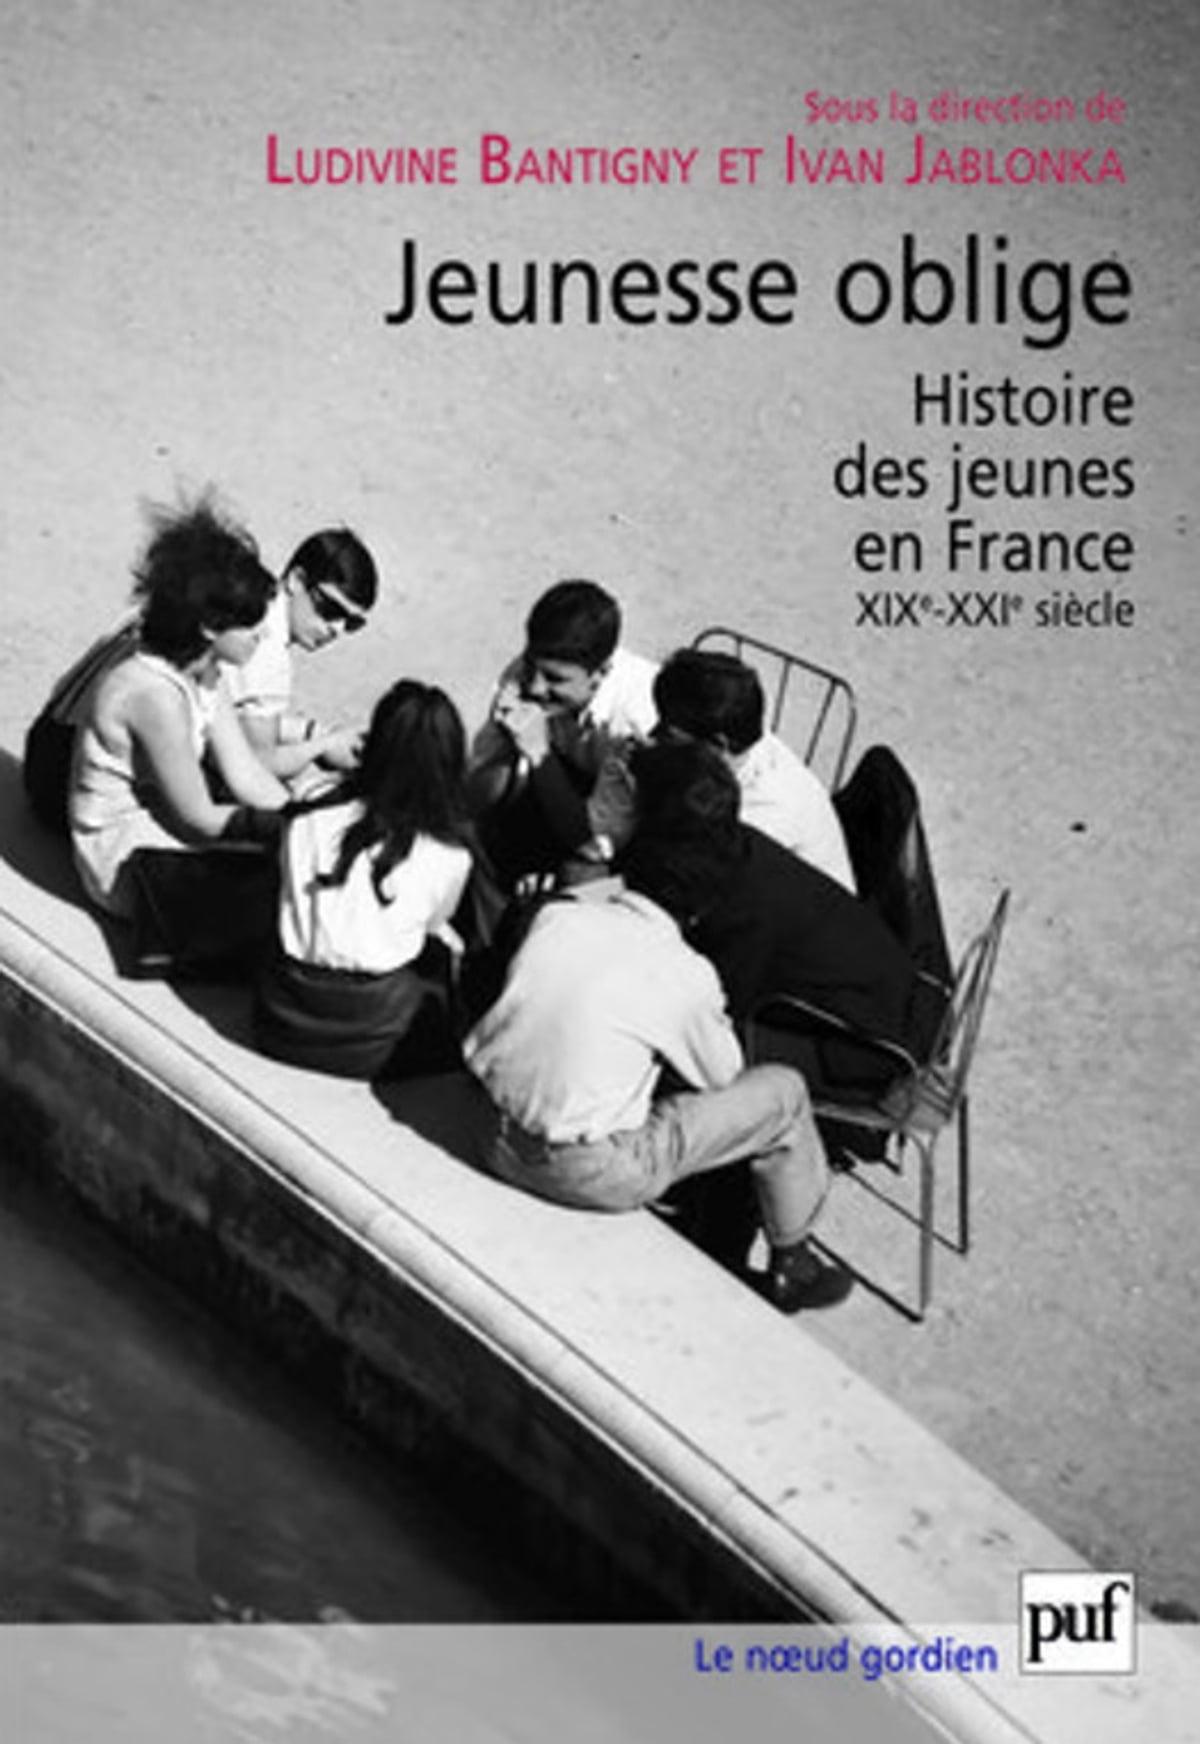 Jeunesse oblige eBook de Ludivine Bantigny - 9782130739760   Rakuten Kobo